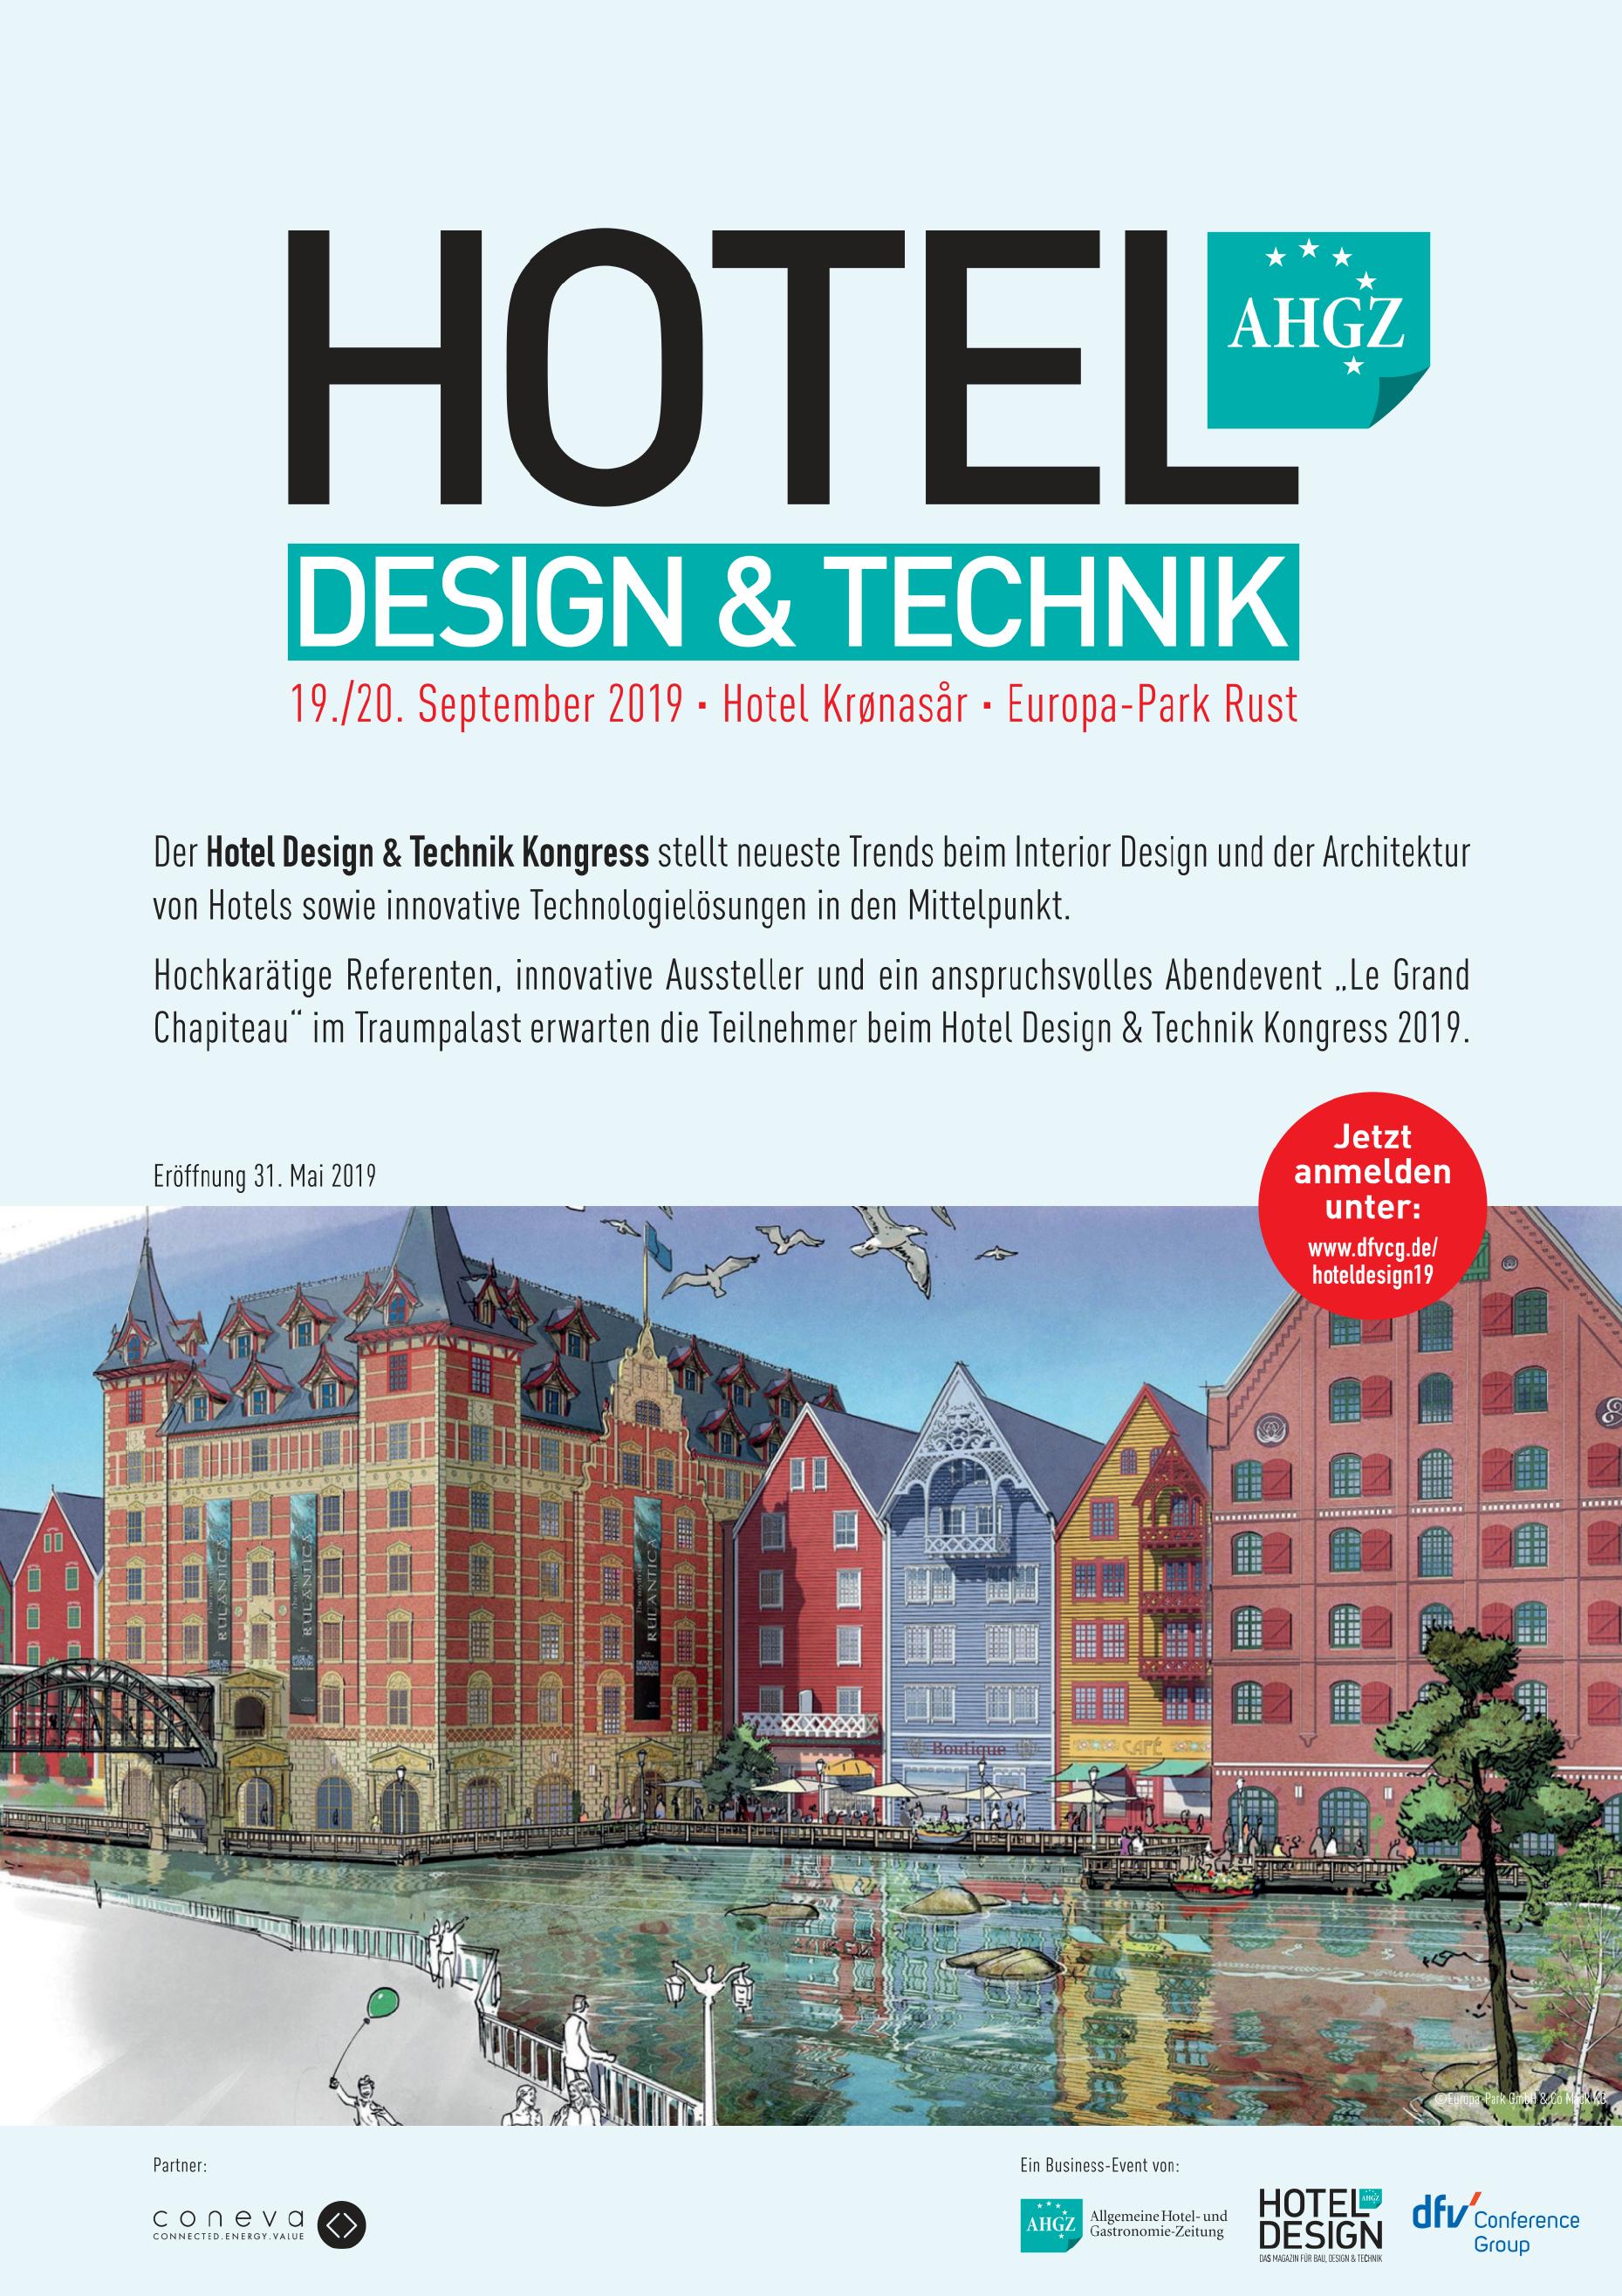 Hotel Design & Technik Kongress